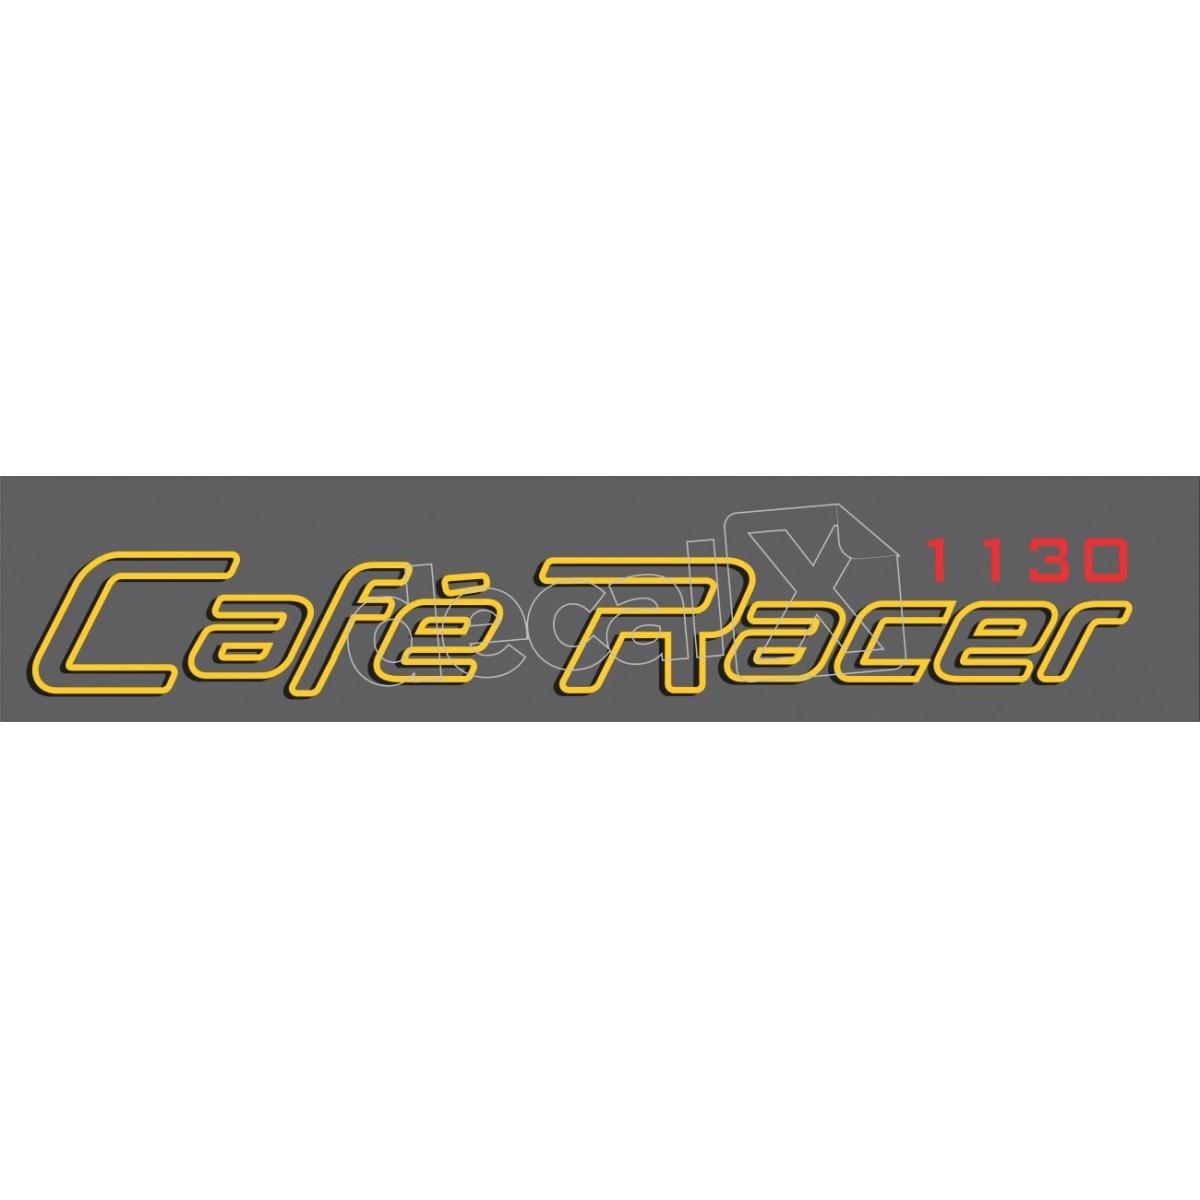 Adesivo Benelli Tnt 1130 Cafe Racer Par Decalx